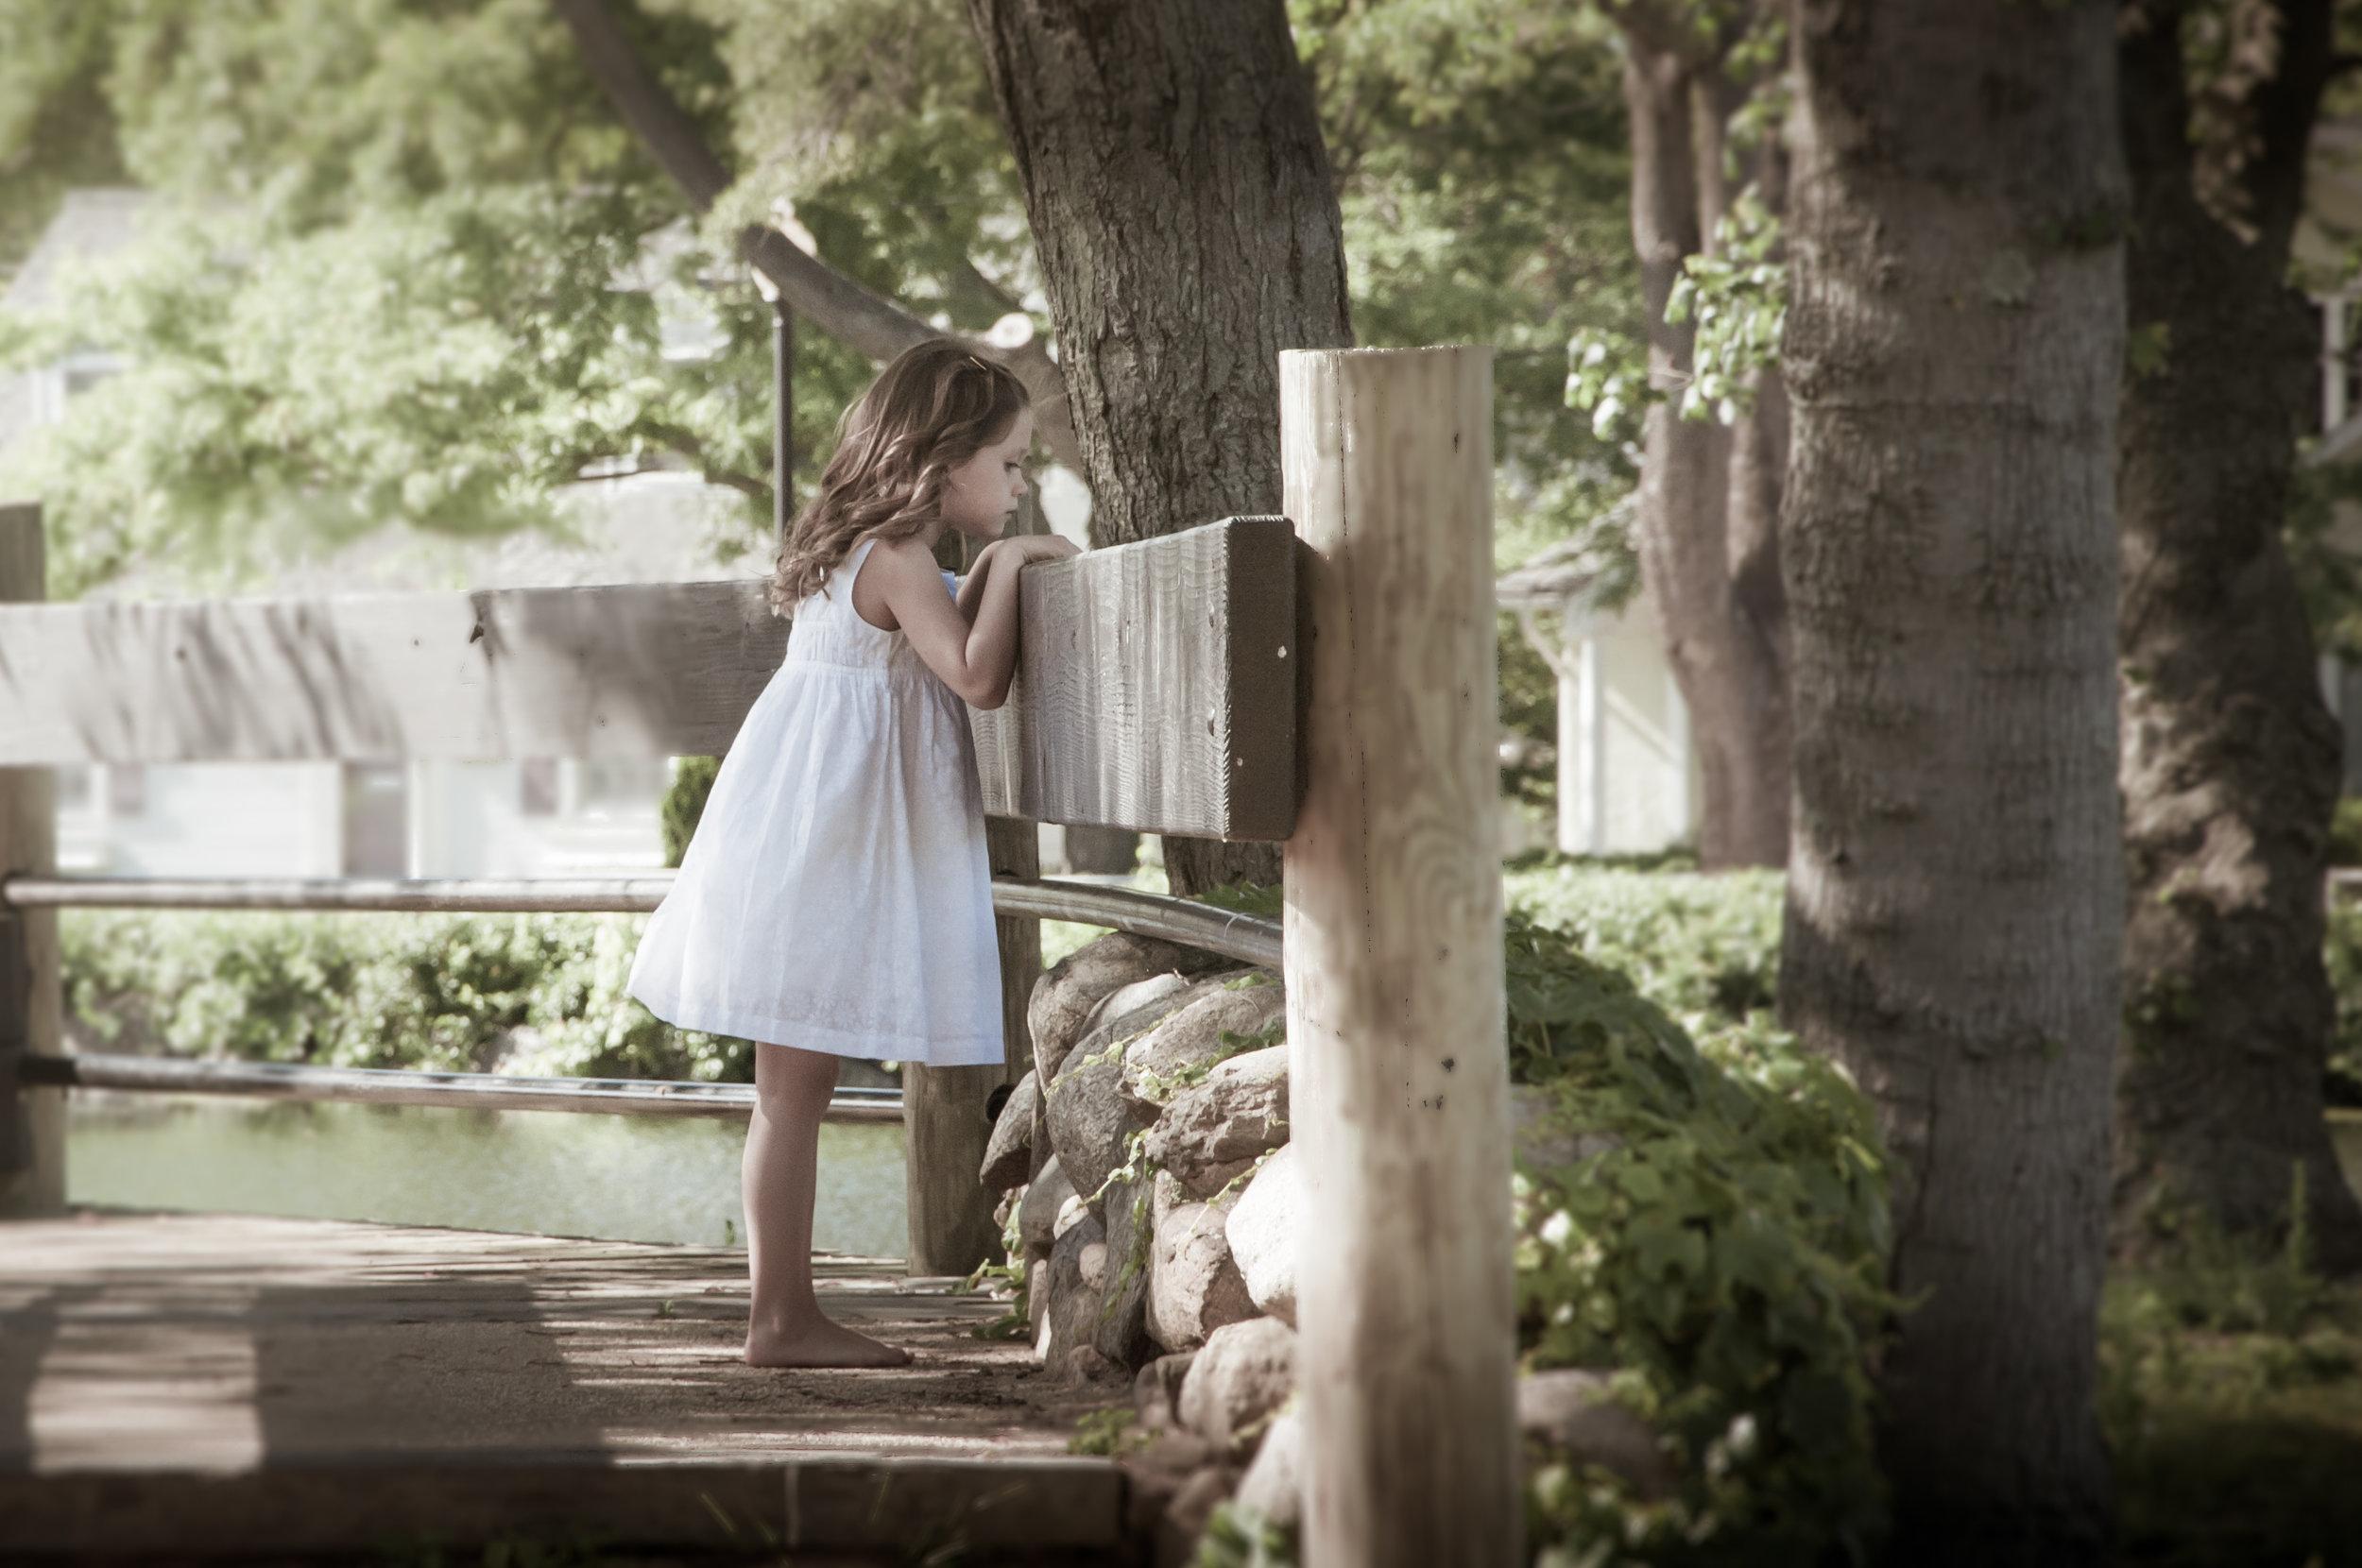 CarrieWestonStudios_Northport_Family_Maternity_Wedding_Portraits_NY_Photography_Photographer-8614.jpg